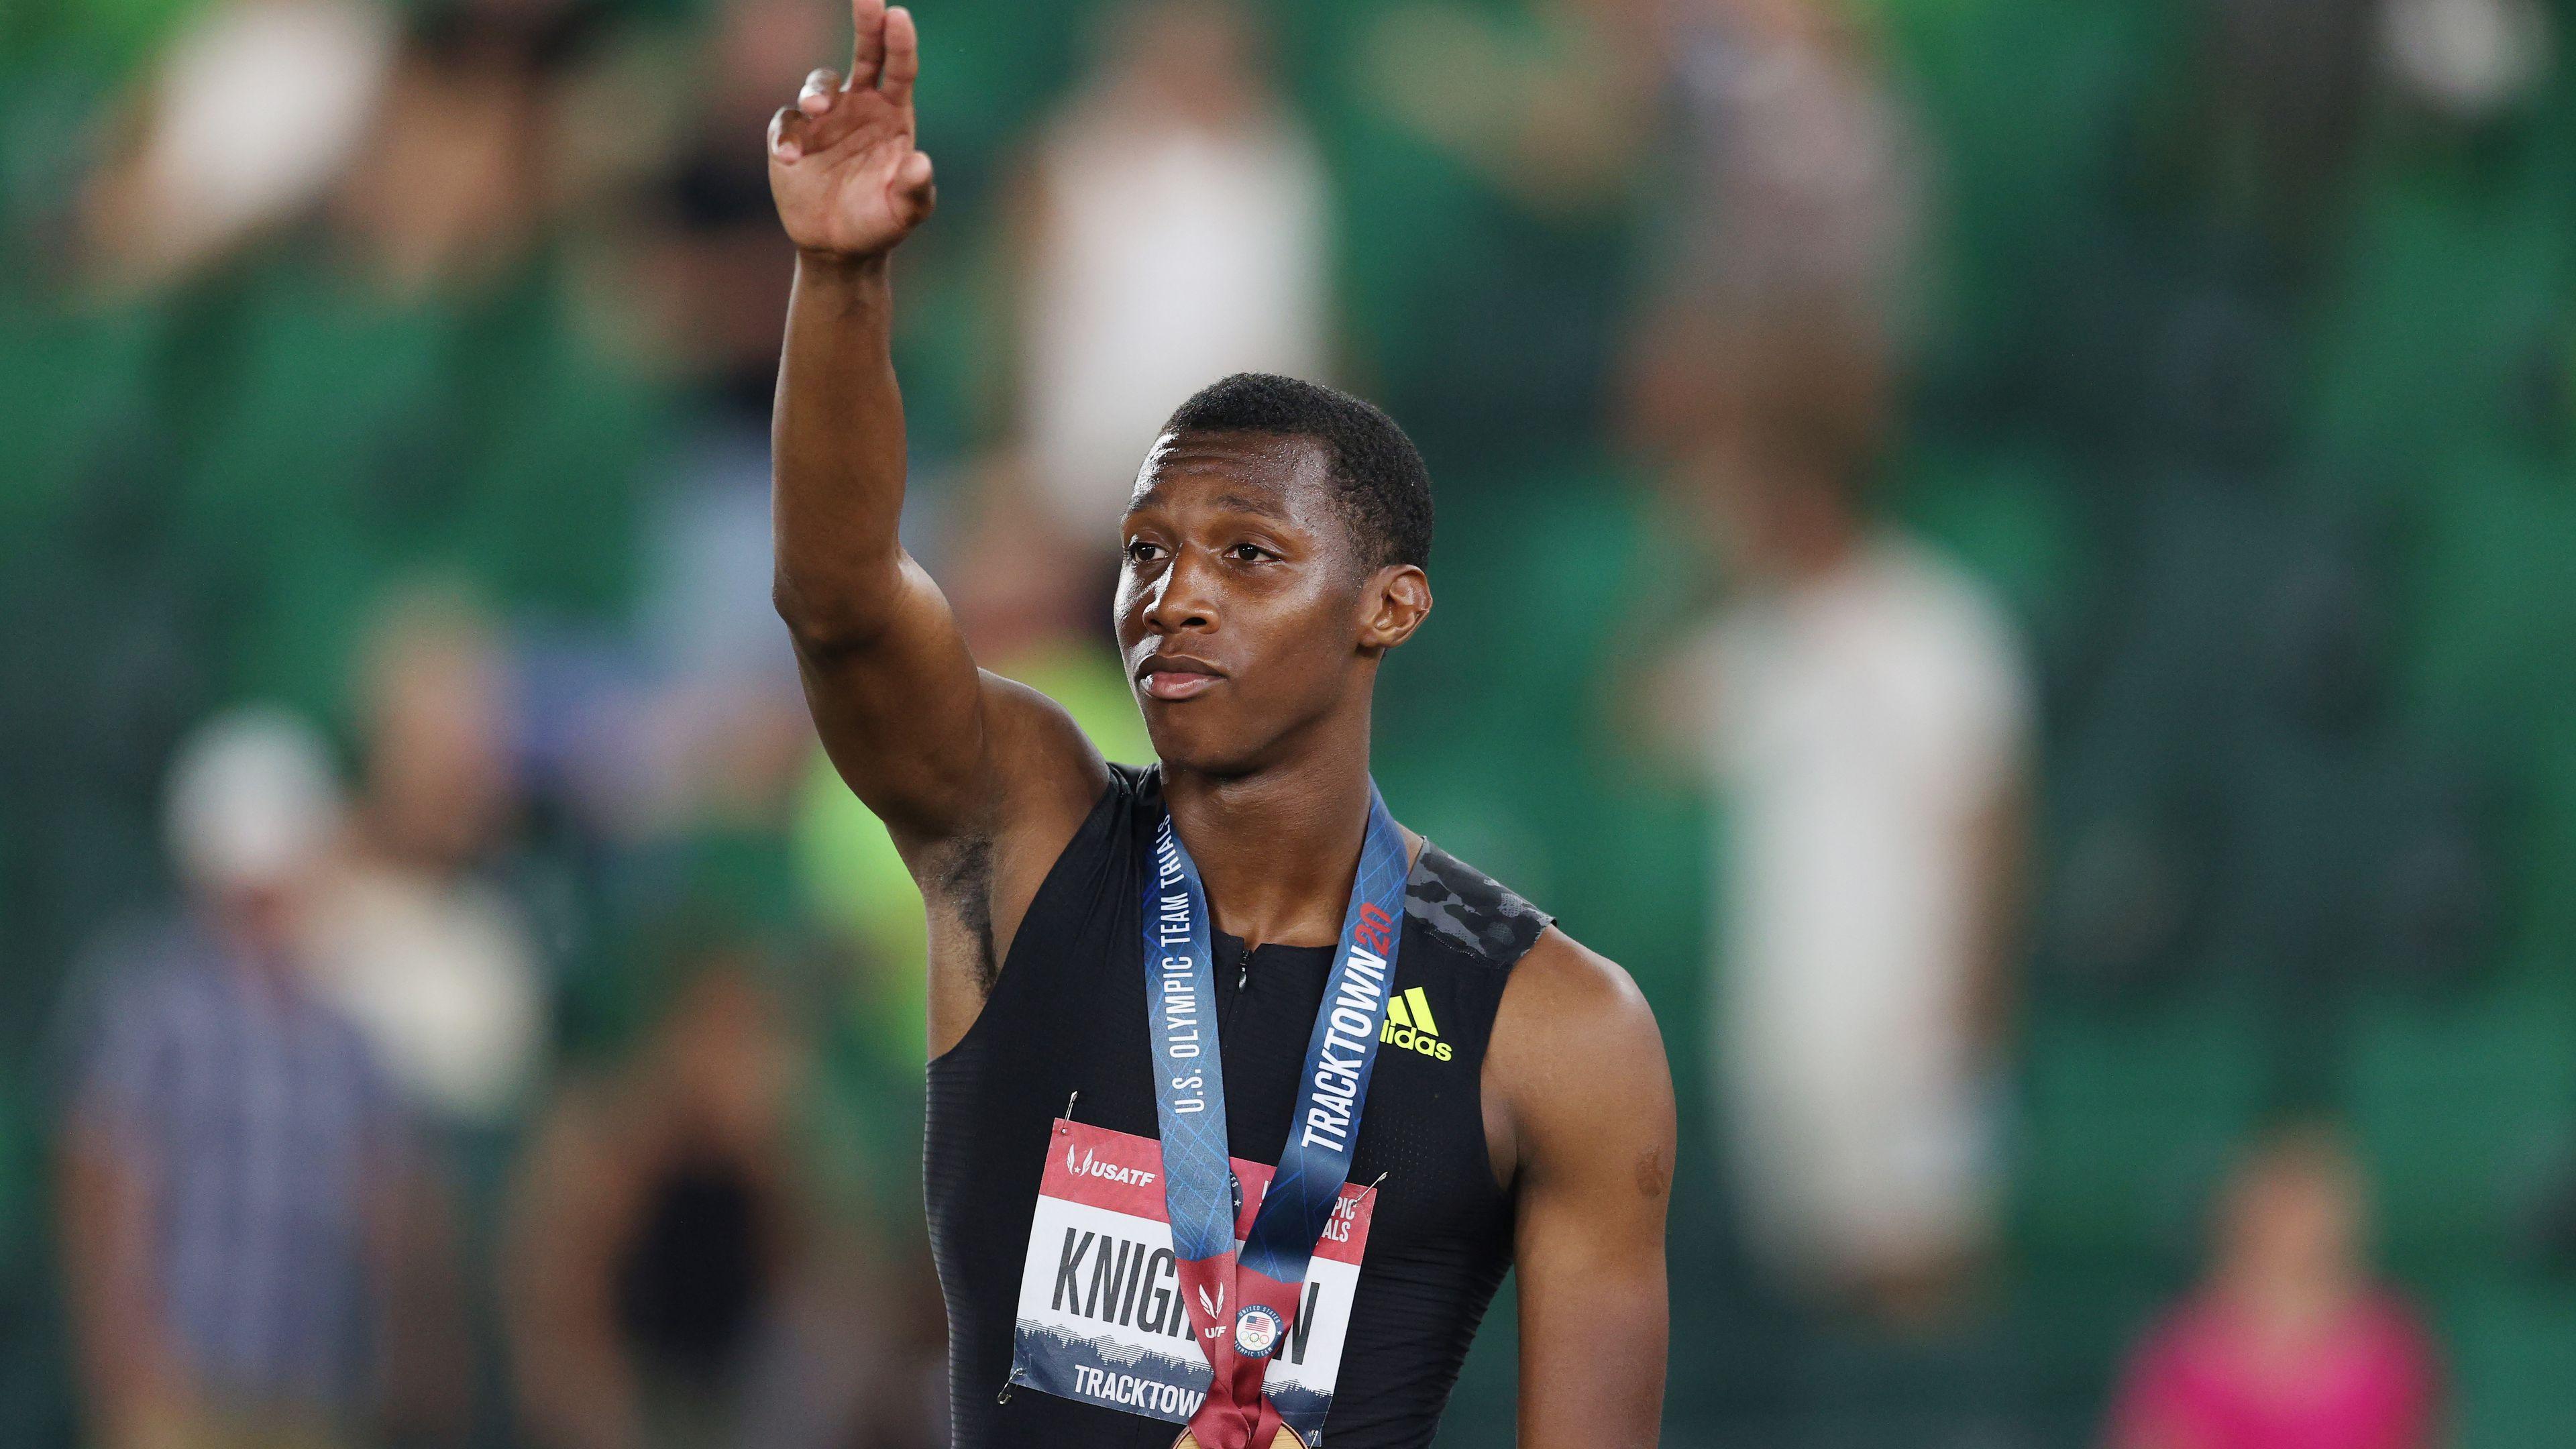 17-year-old Erriyon Knighton surpasses Usain Bolt record in blistering display